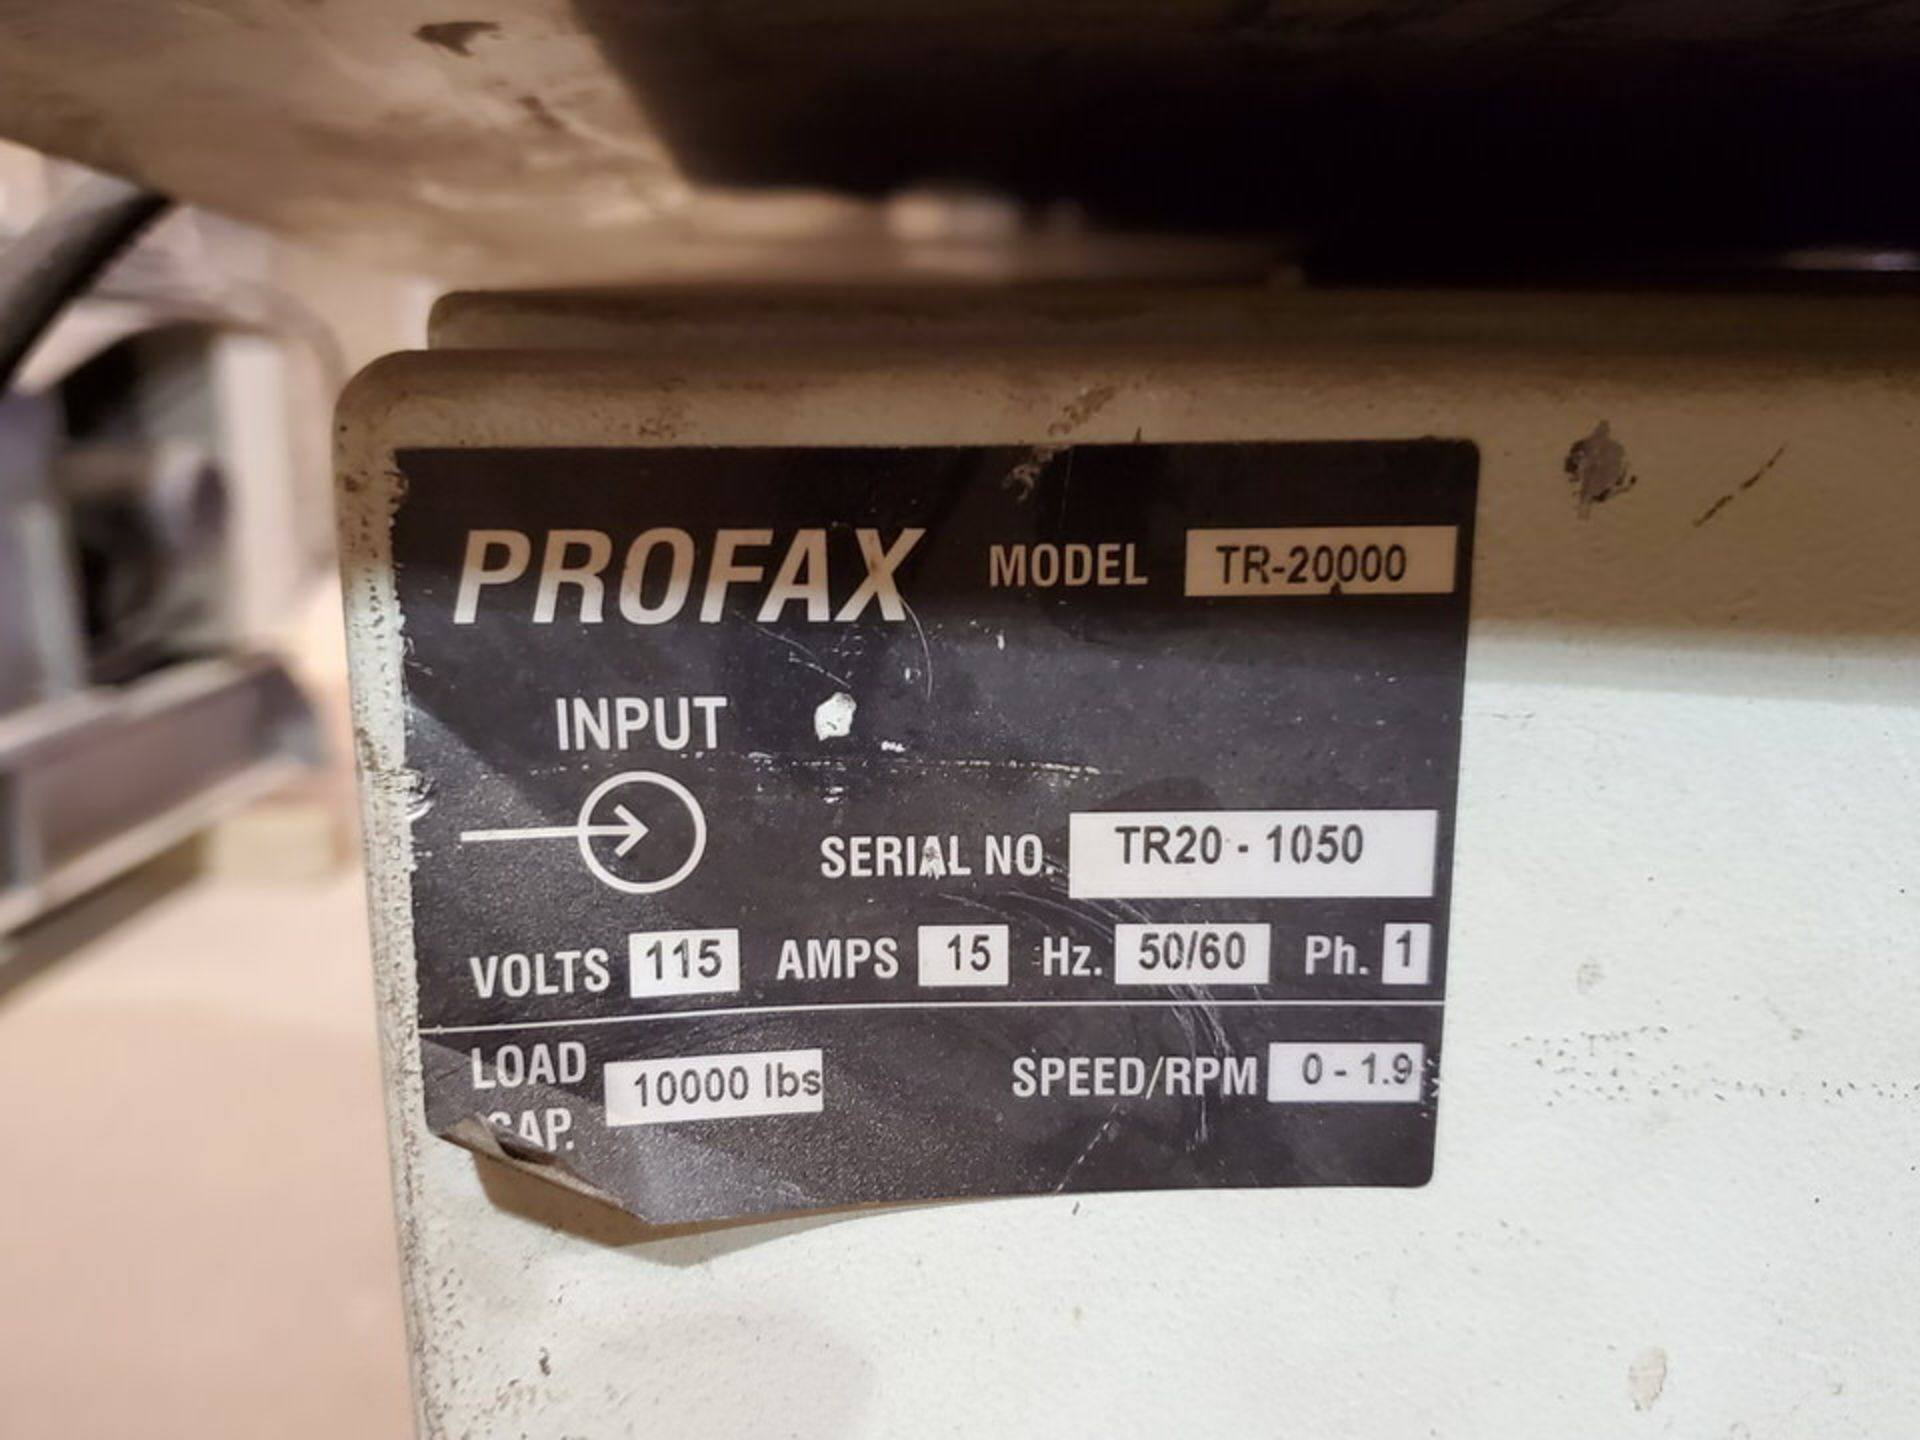 "Profax TR-20000 Turn Roll 10K Cap., 115V, 15A, 50/60HZ, 1PH, RPM: 0-1.9; 5"" Wheel Dia. - Image 8 of 8"